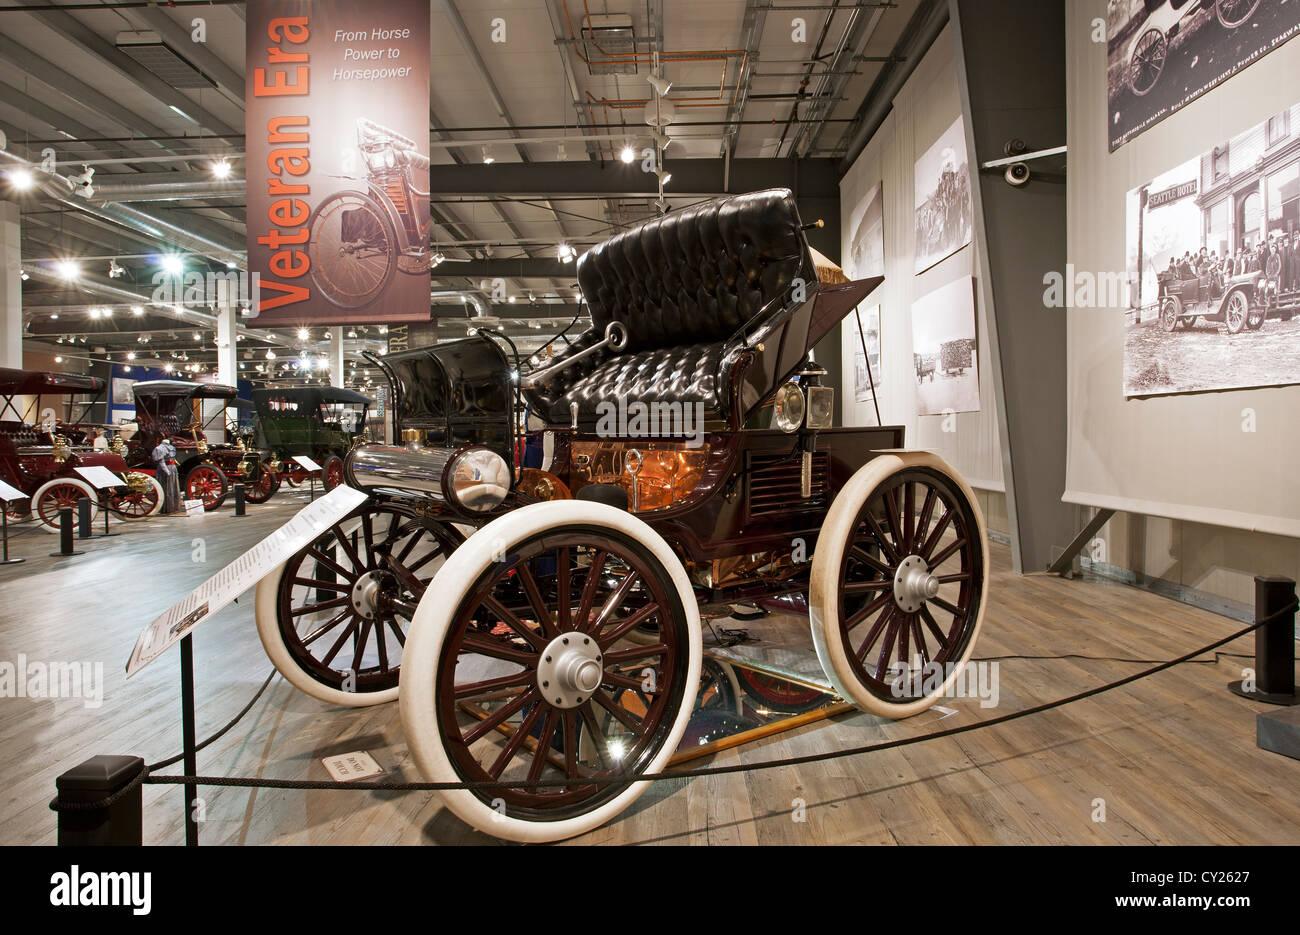 1898 Hay Motor Vehicle,model Stanhope Phaeton. Fountainhead Antique Auto Museum. Fairbanks.Alaska. USA - Stock Image